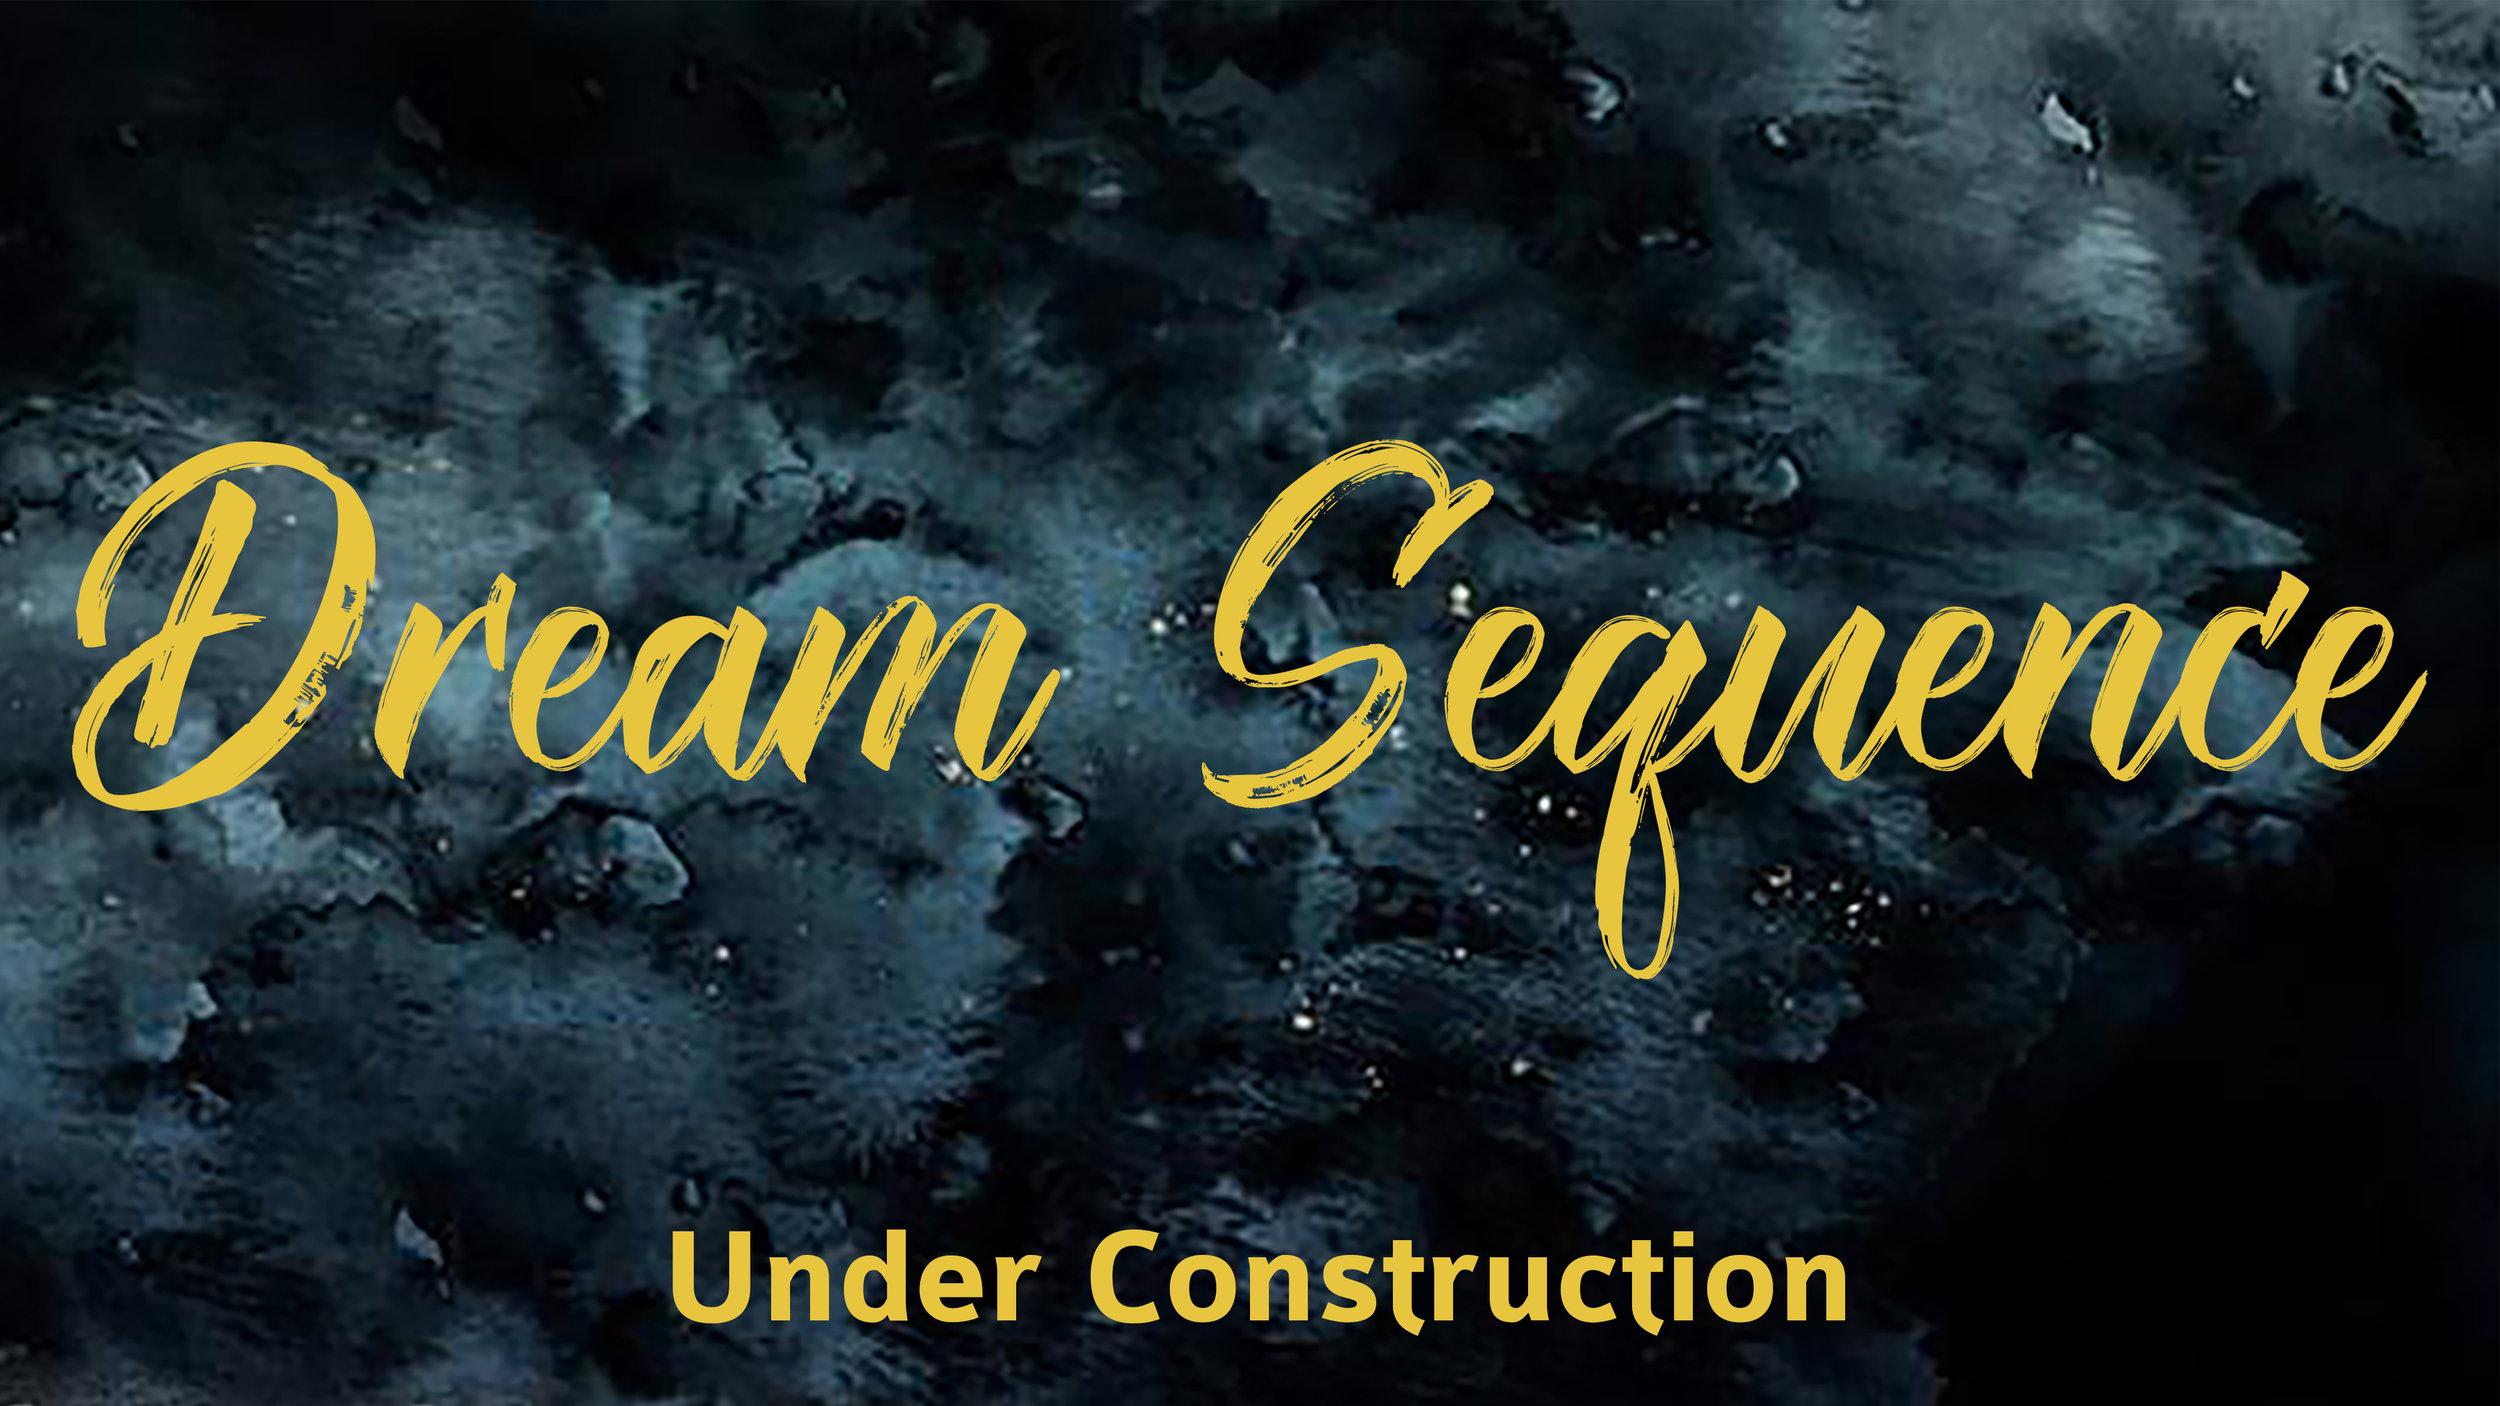 2016.12.11_DreamSequence_UnderConstruction.jpg